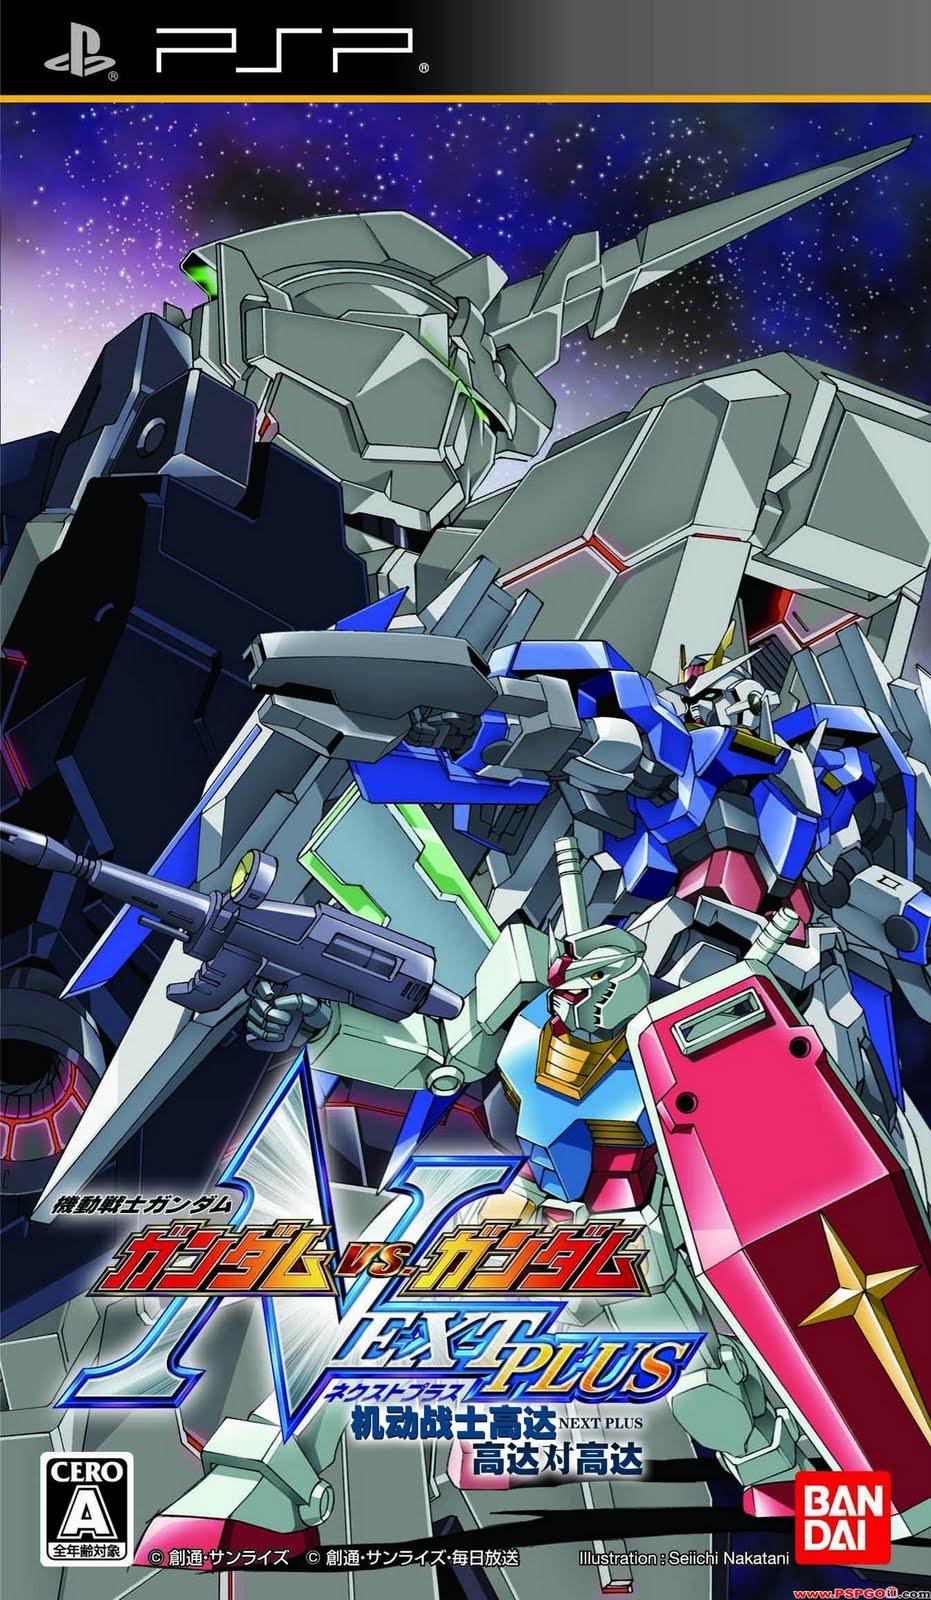 Psp Kidou Senshi Gundam Gundam Vs Gundam Next Plus